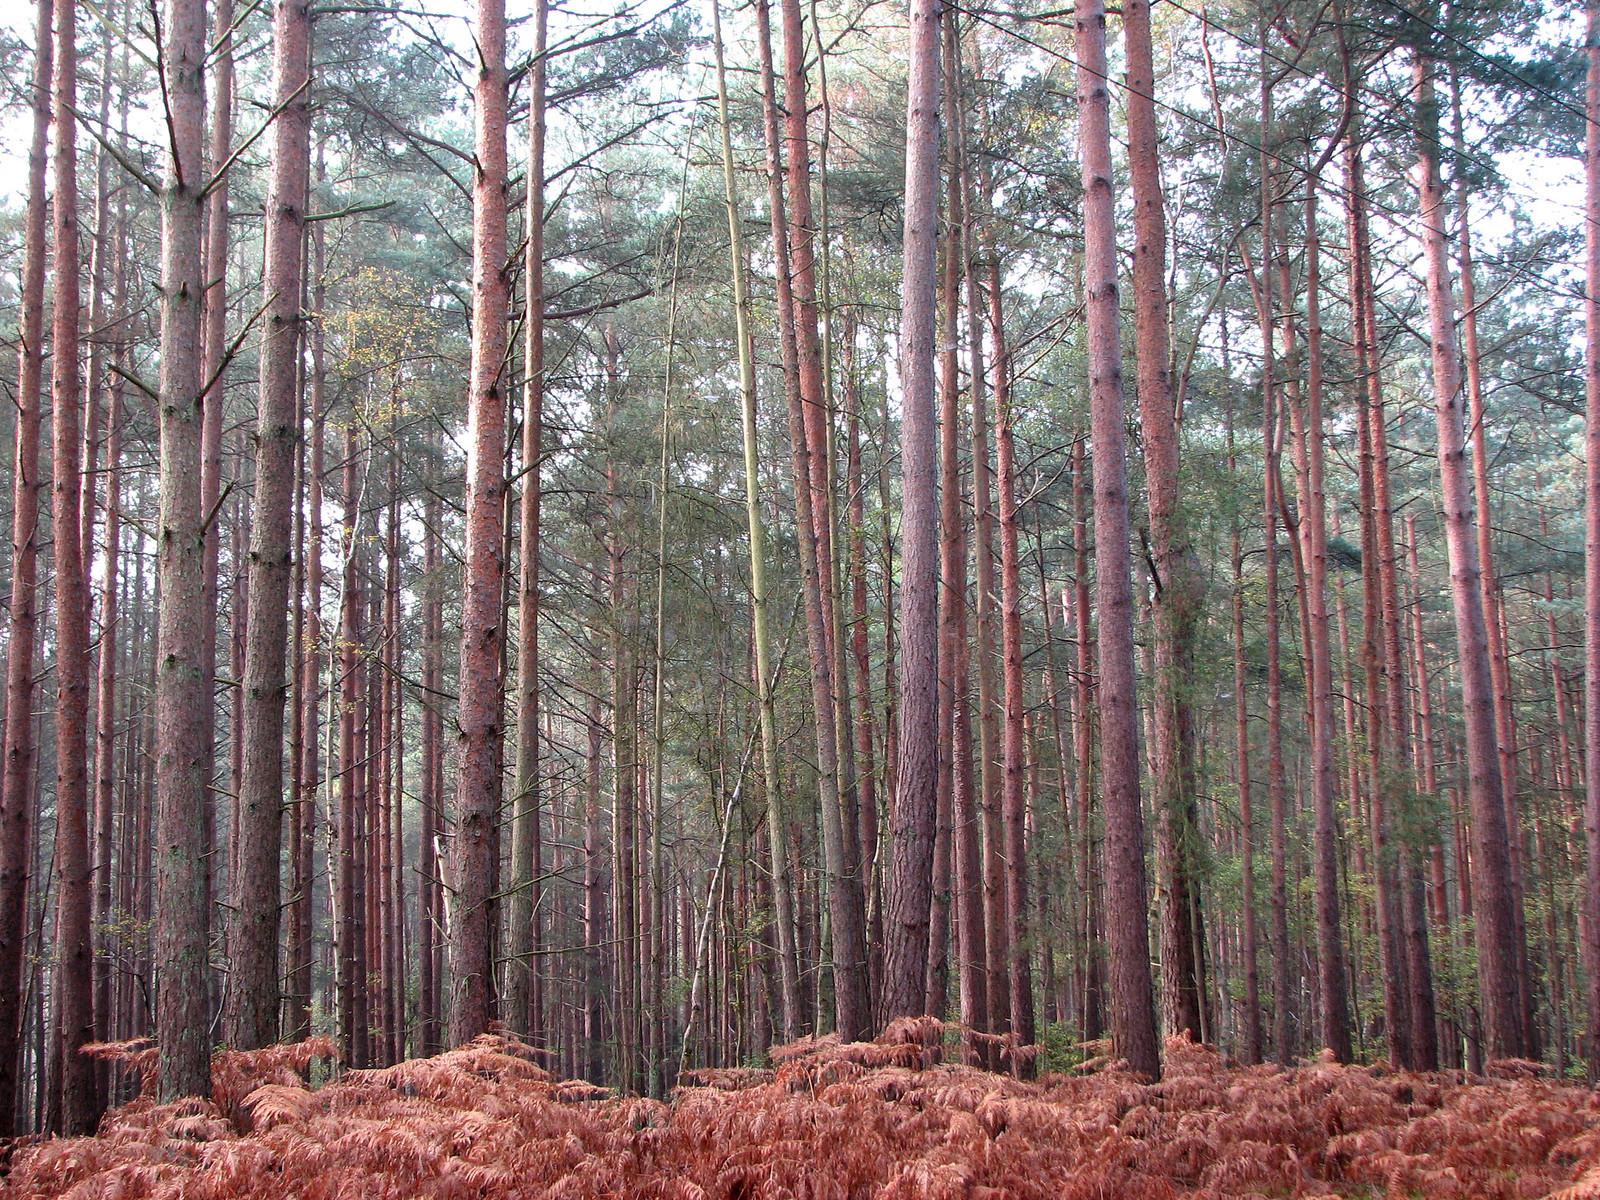 Frosty birches